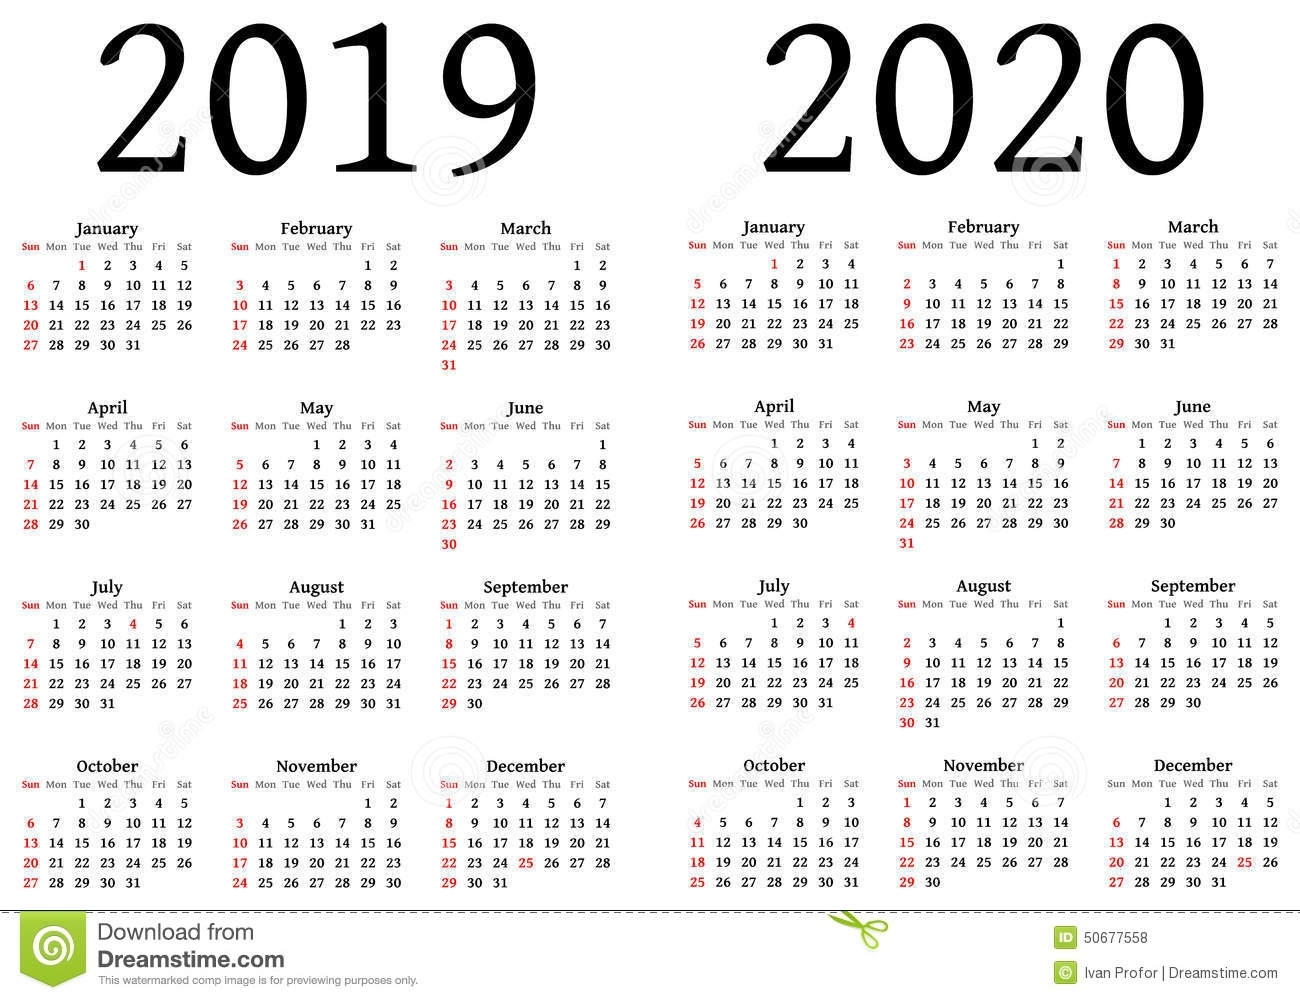 Calendar For 2019 And 2020 Stock Vector. Illustration Of Designers regarding Year Long Calendar For 2019-2020 Printable